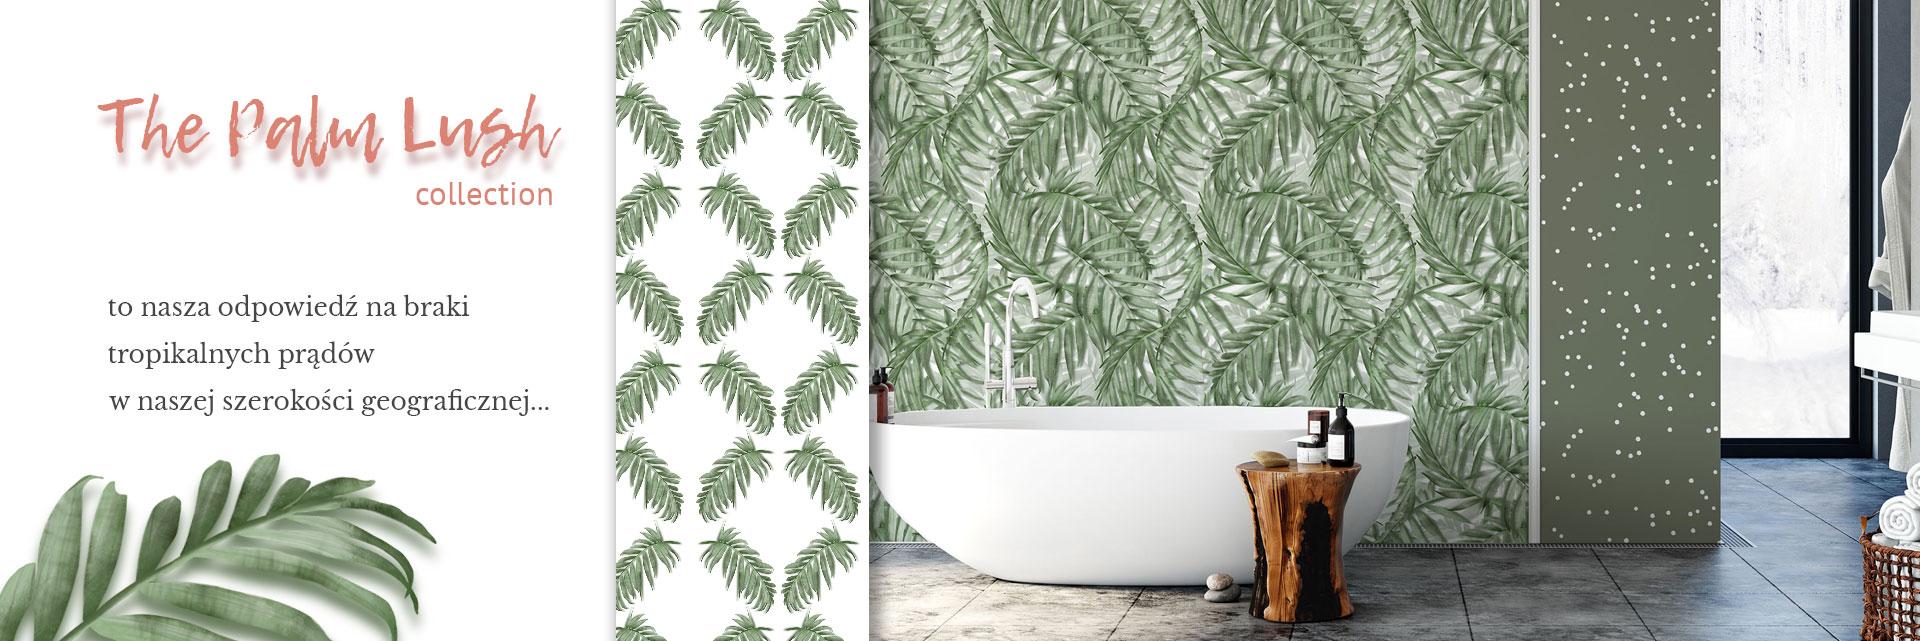 tapeta tropikalna, tapeta boho, tapeta w liście palmy